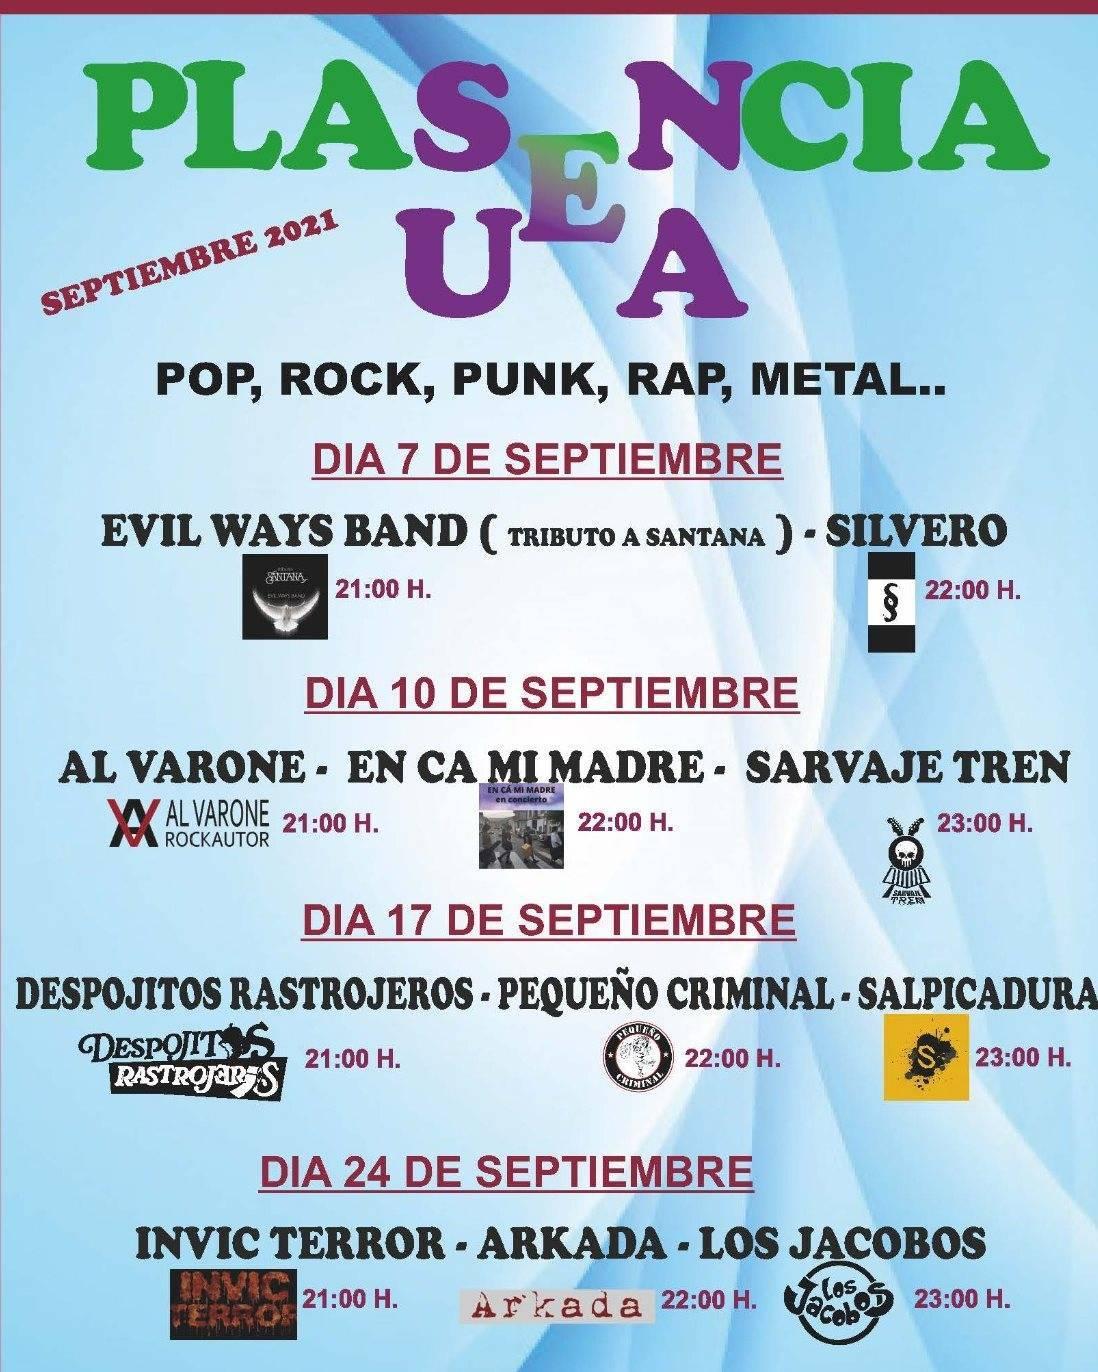 II edición del Festival de Música 'Plasencia Suena' - Plasencia (Cáceres)